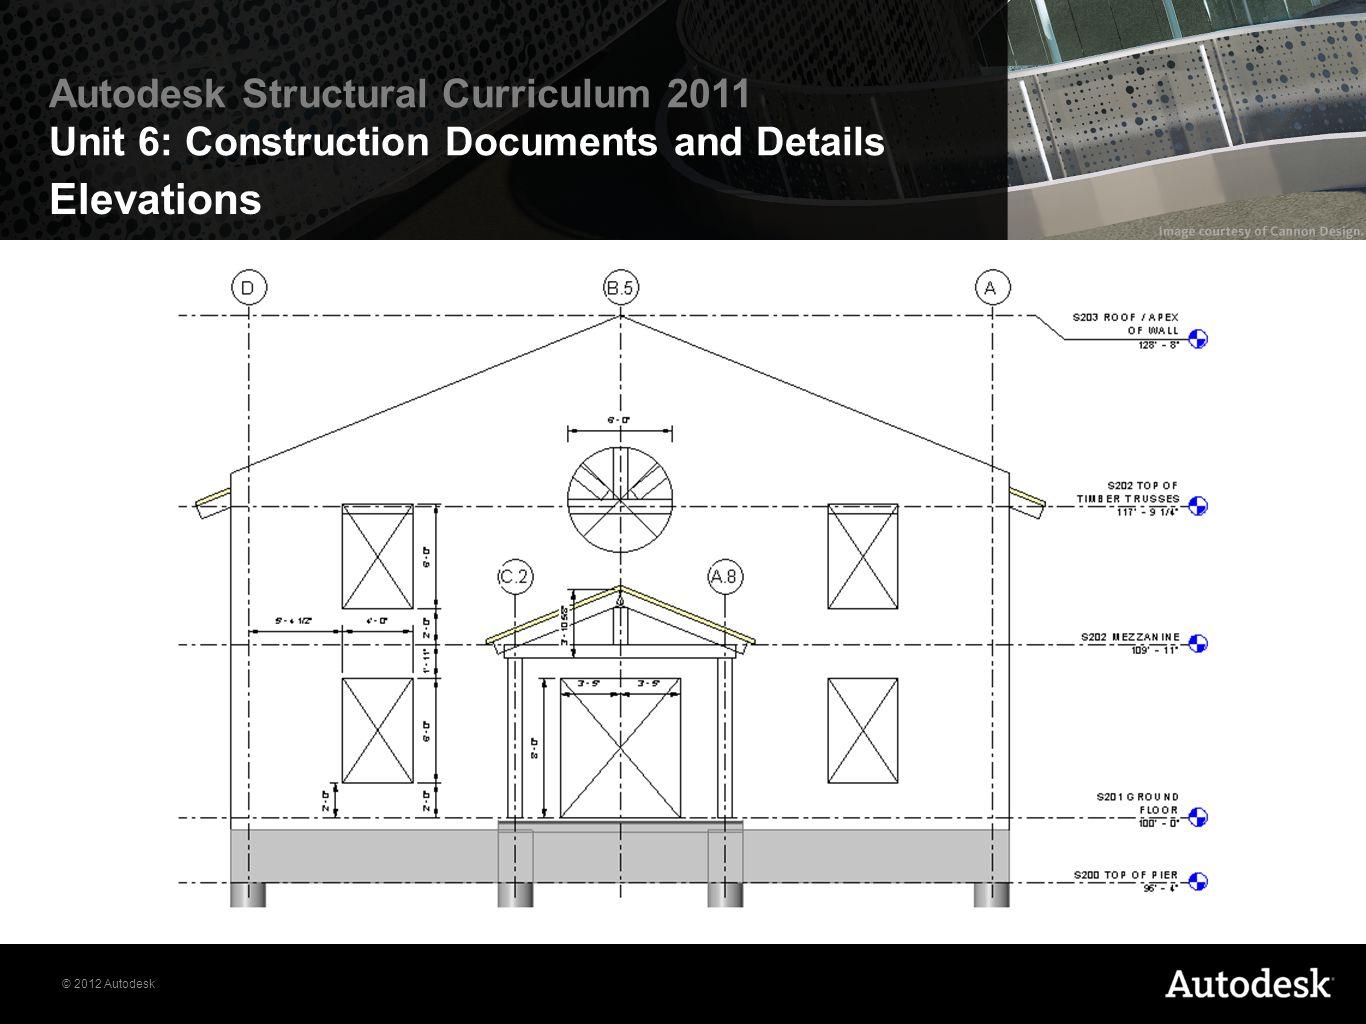 © 2012 Autodesk Autodesk Structural Curriculum 2011 Unit 6: Construction Documents and Details Elevations